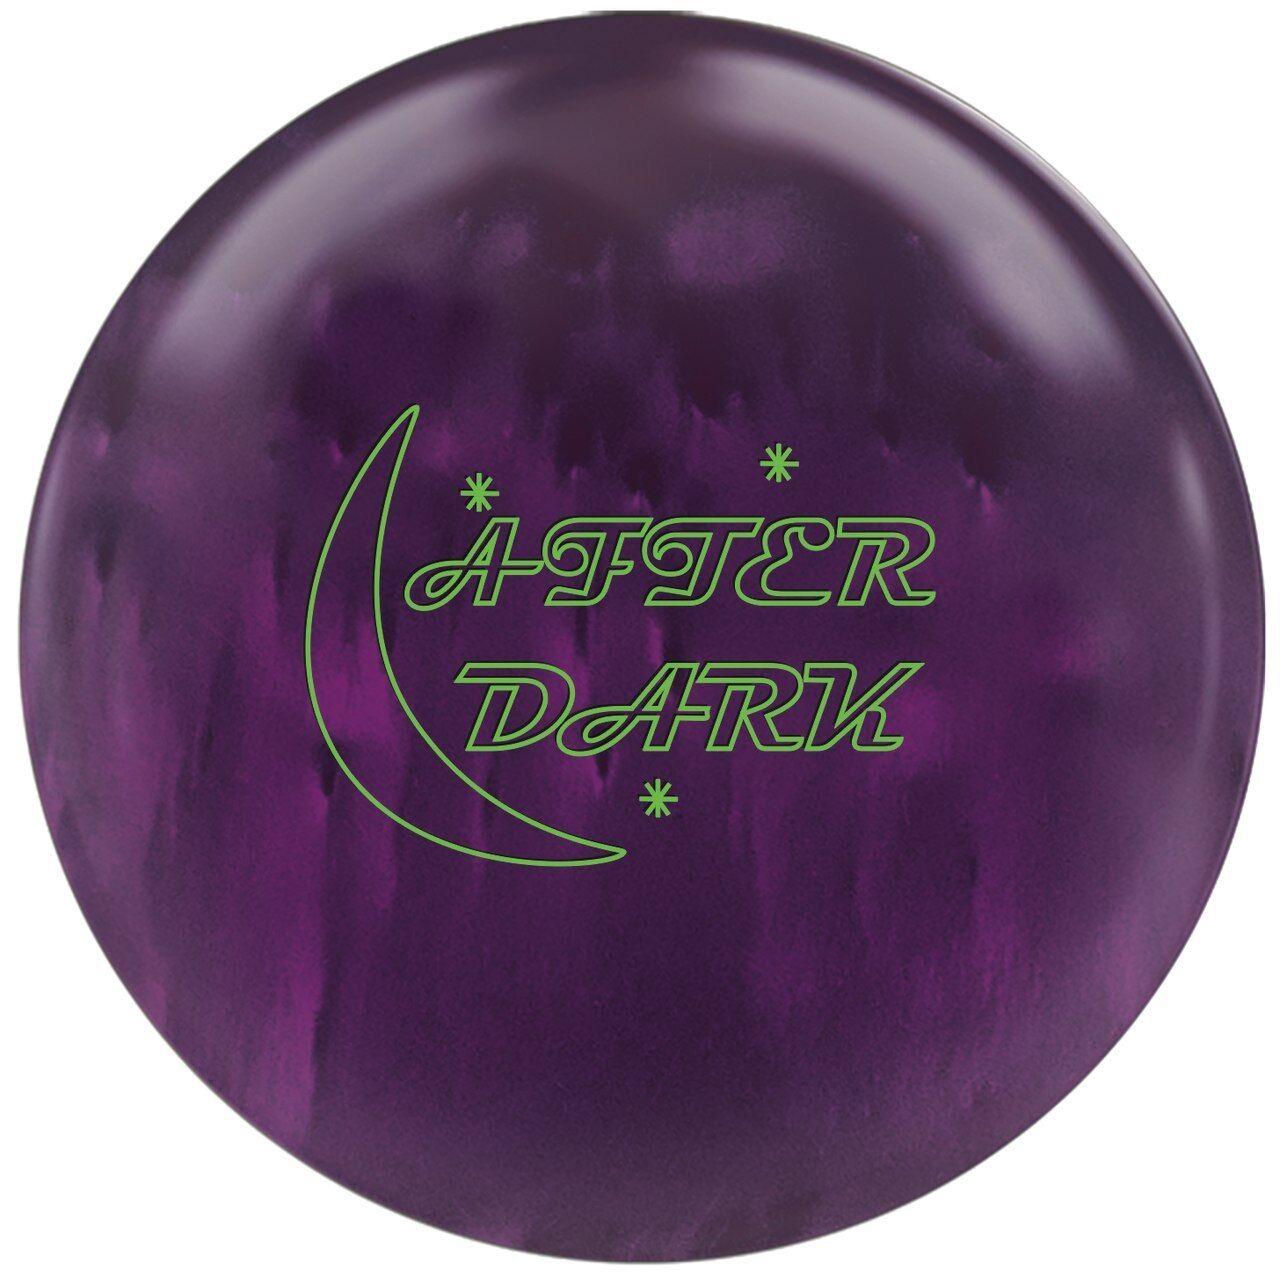 900 Global After Dark Pearl Bowling Ball NIB 1st Quality